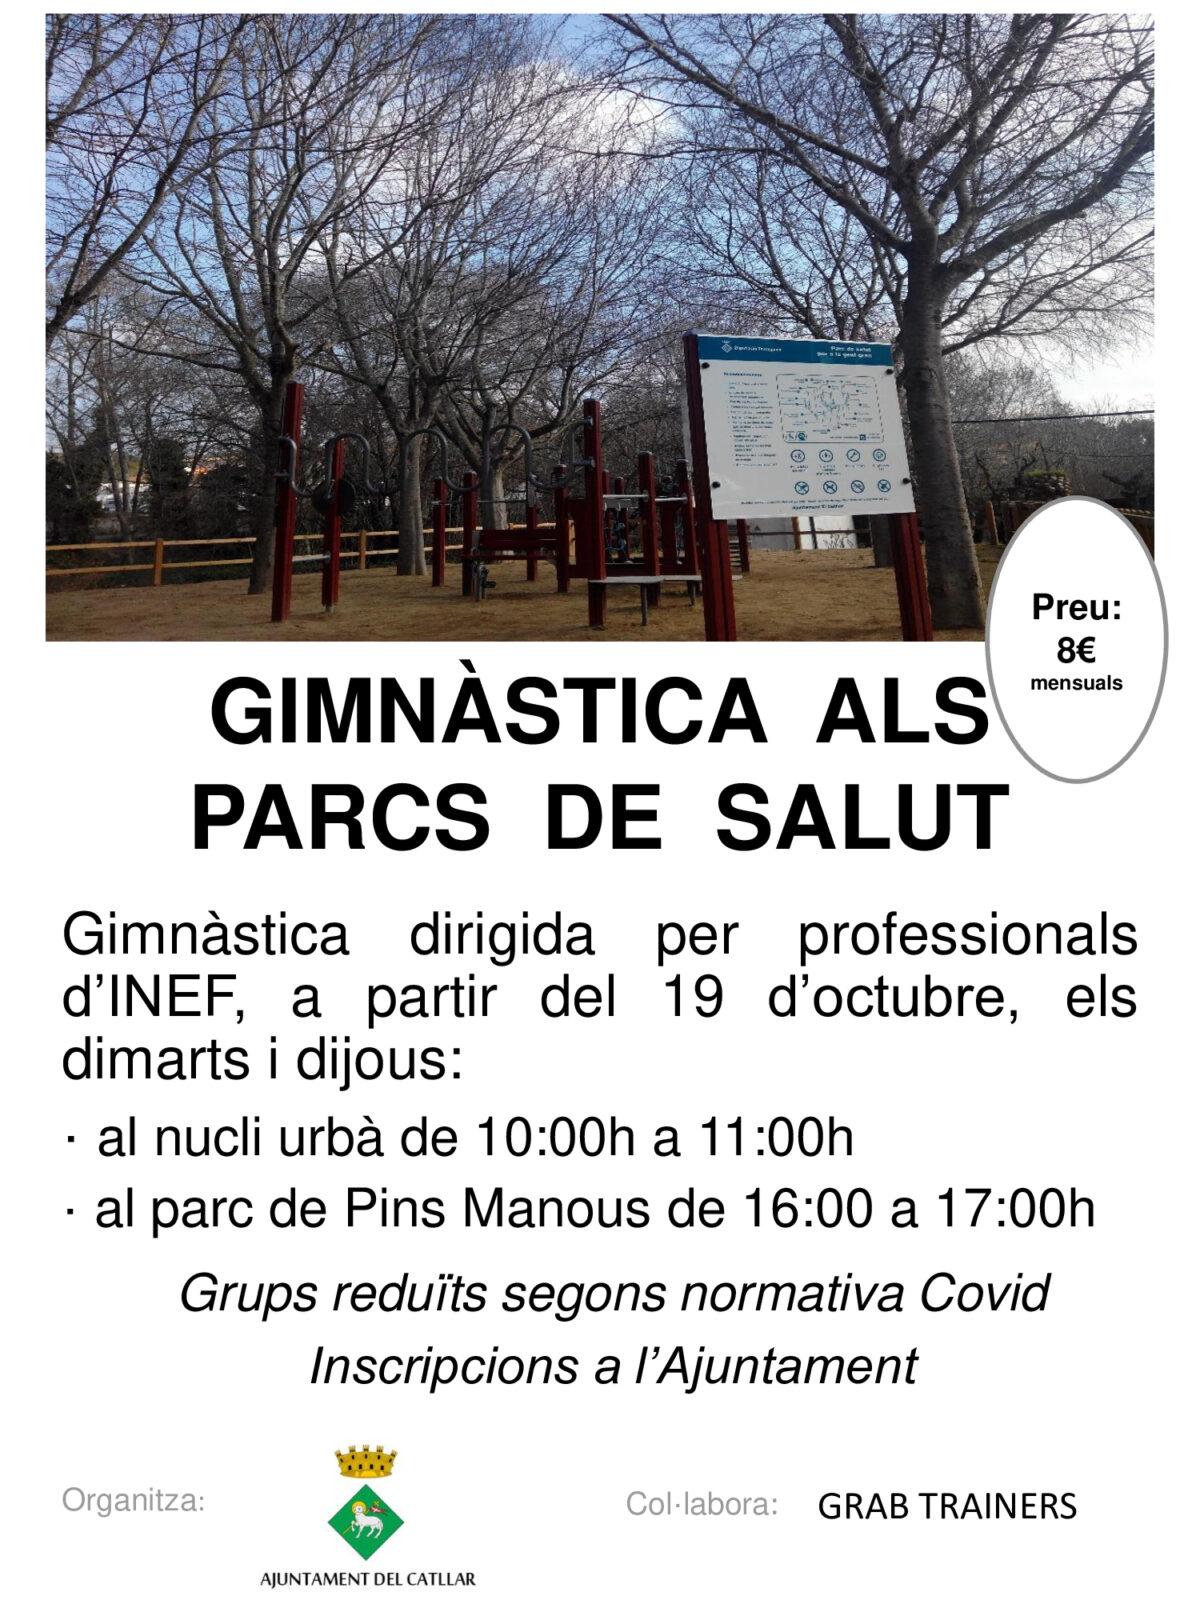 GIMNÀSTICA PARCS DE SALUT – PINS MANOUS